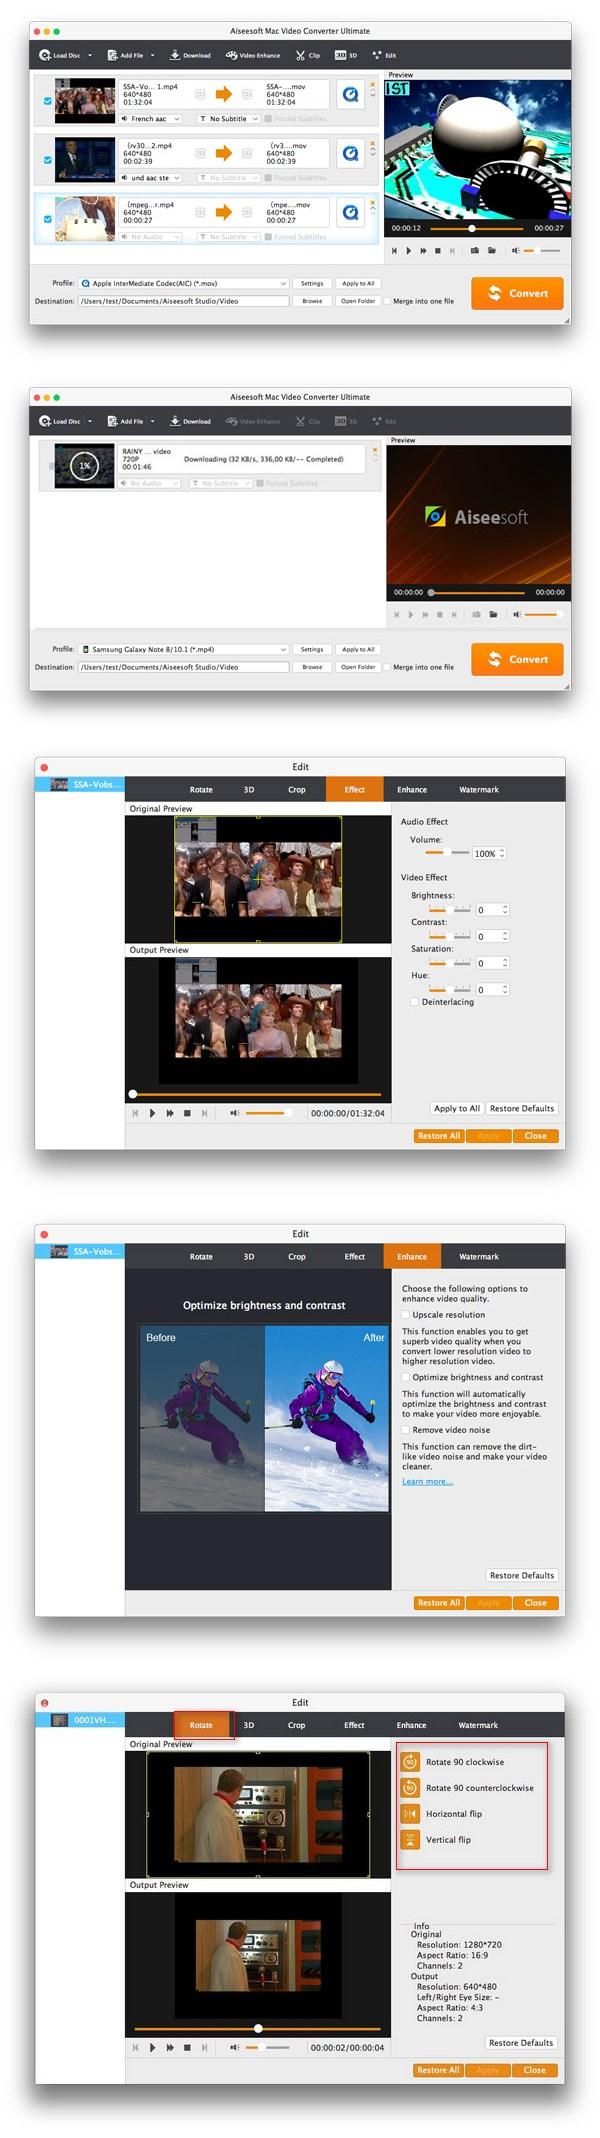 aiseesoft_mac_video_converter_ultimate_v9018